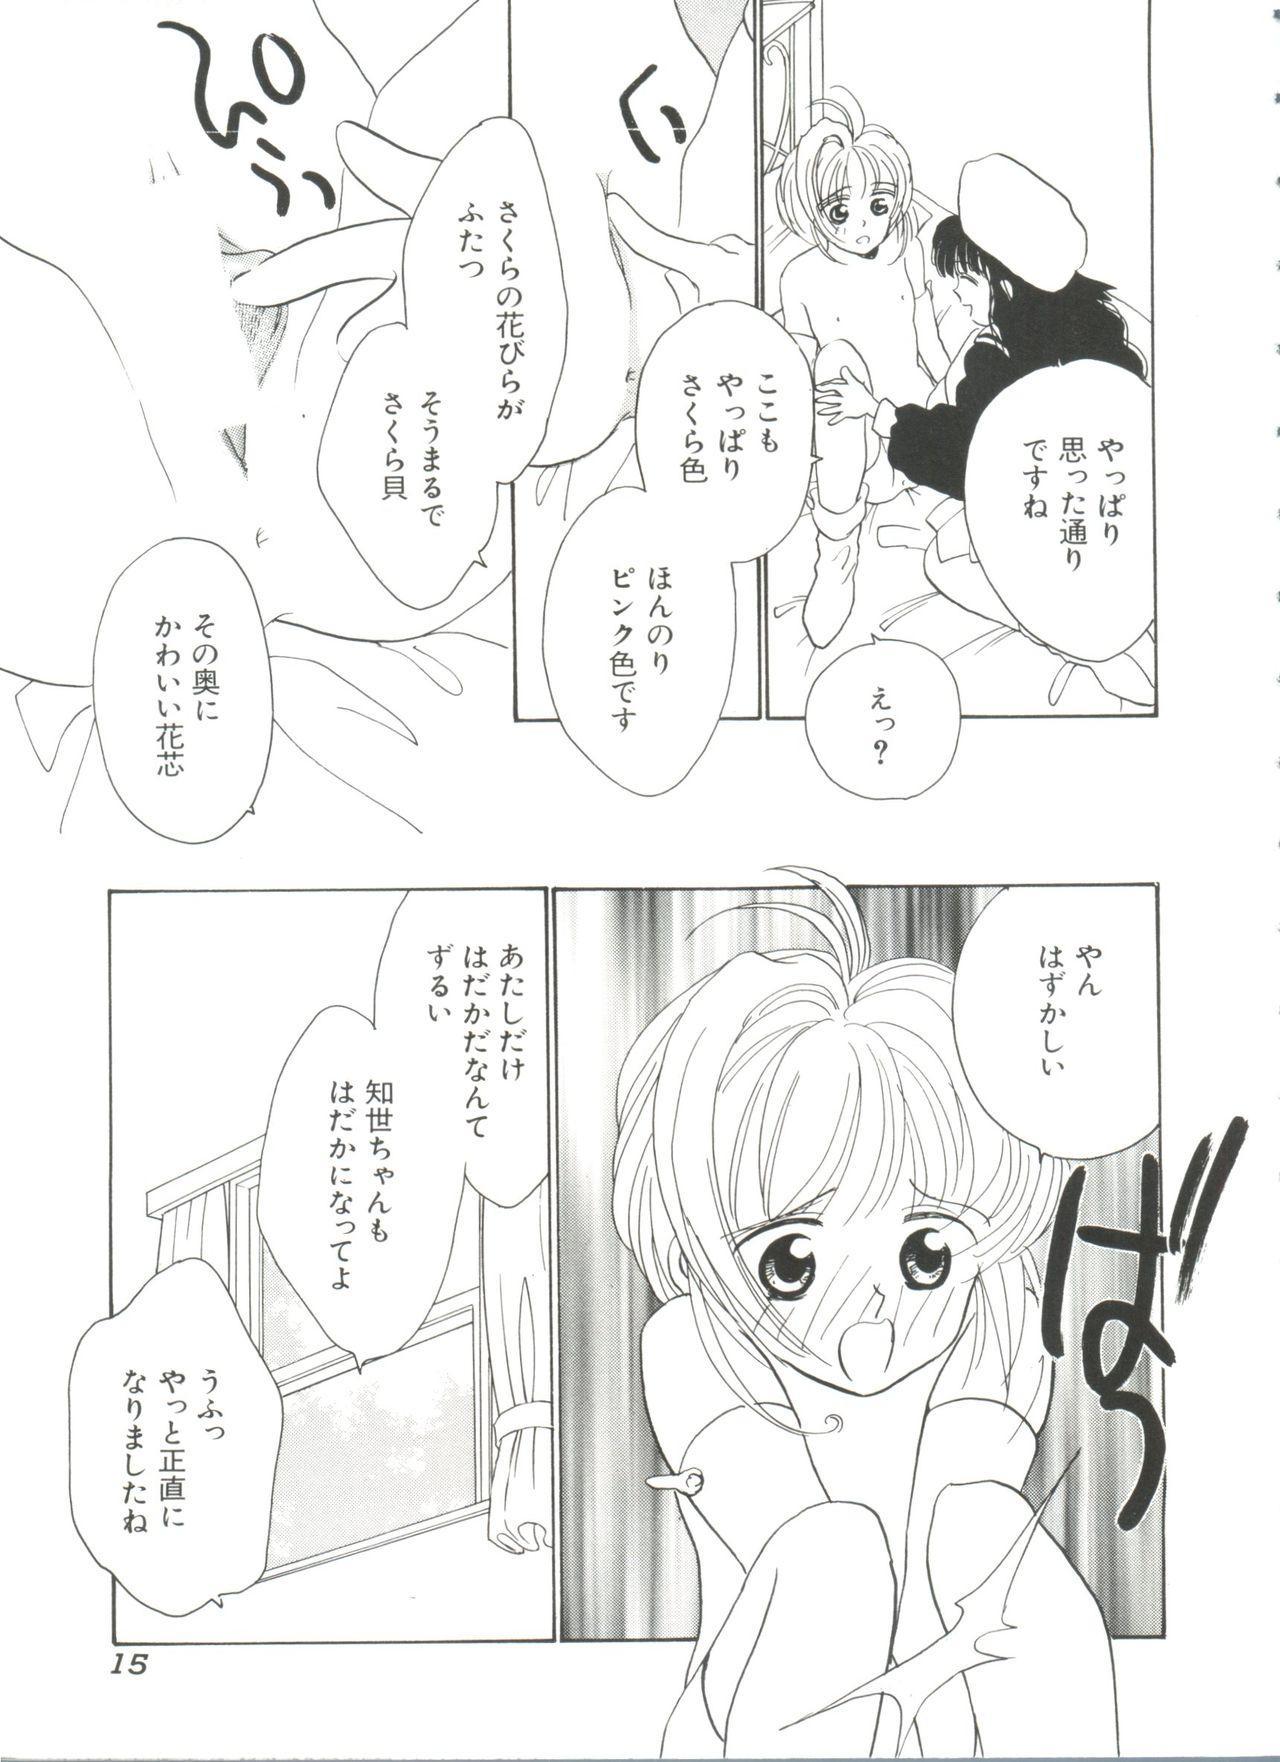 Ero-chan to Issho 16